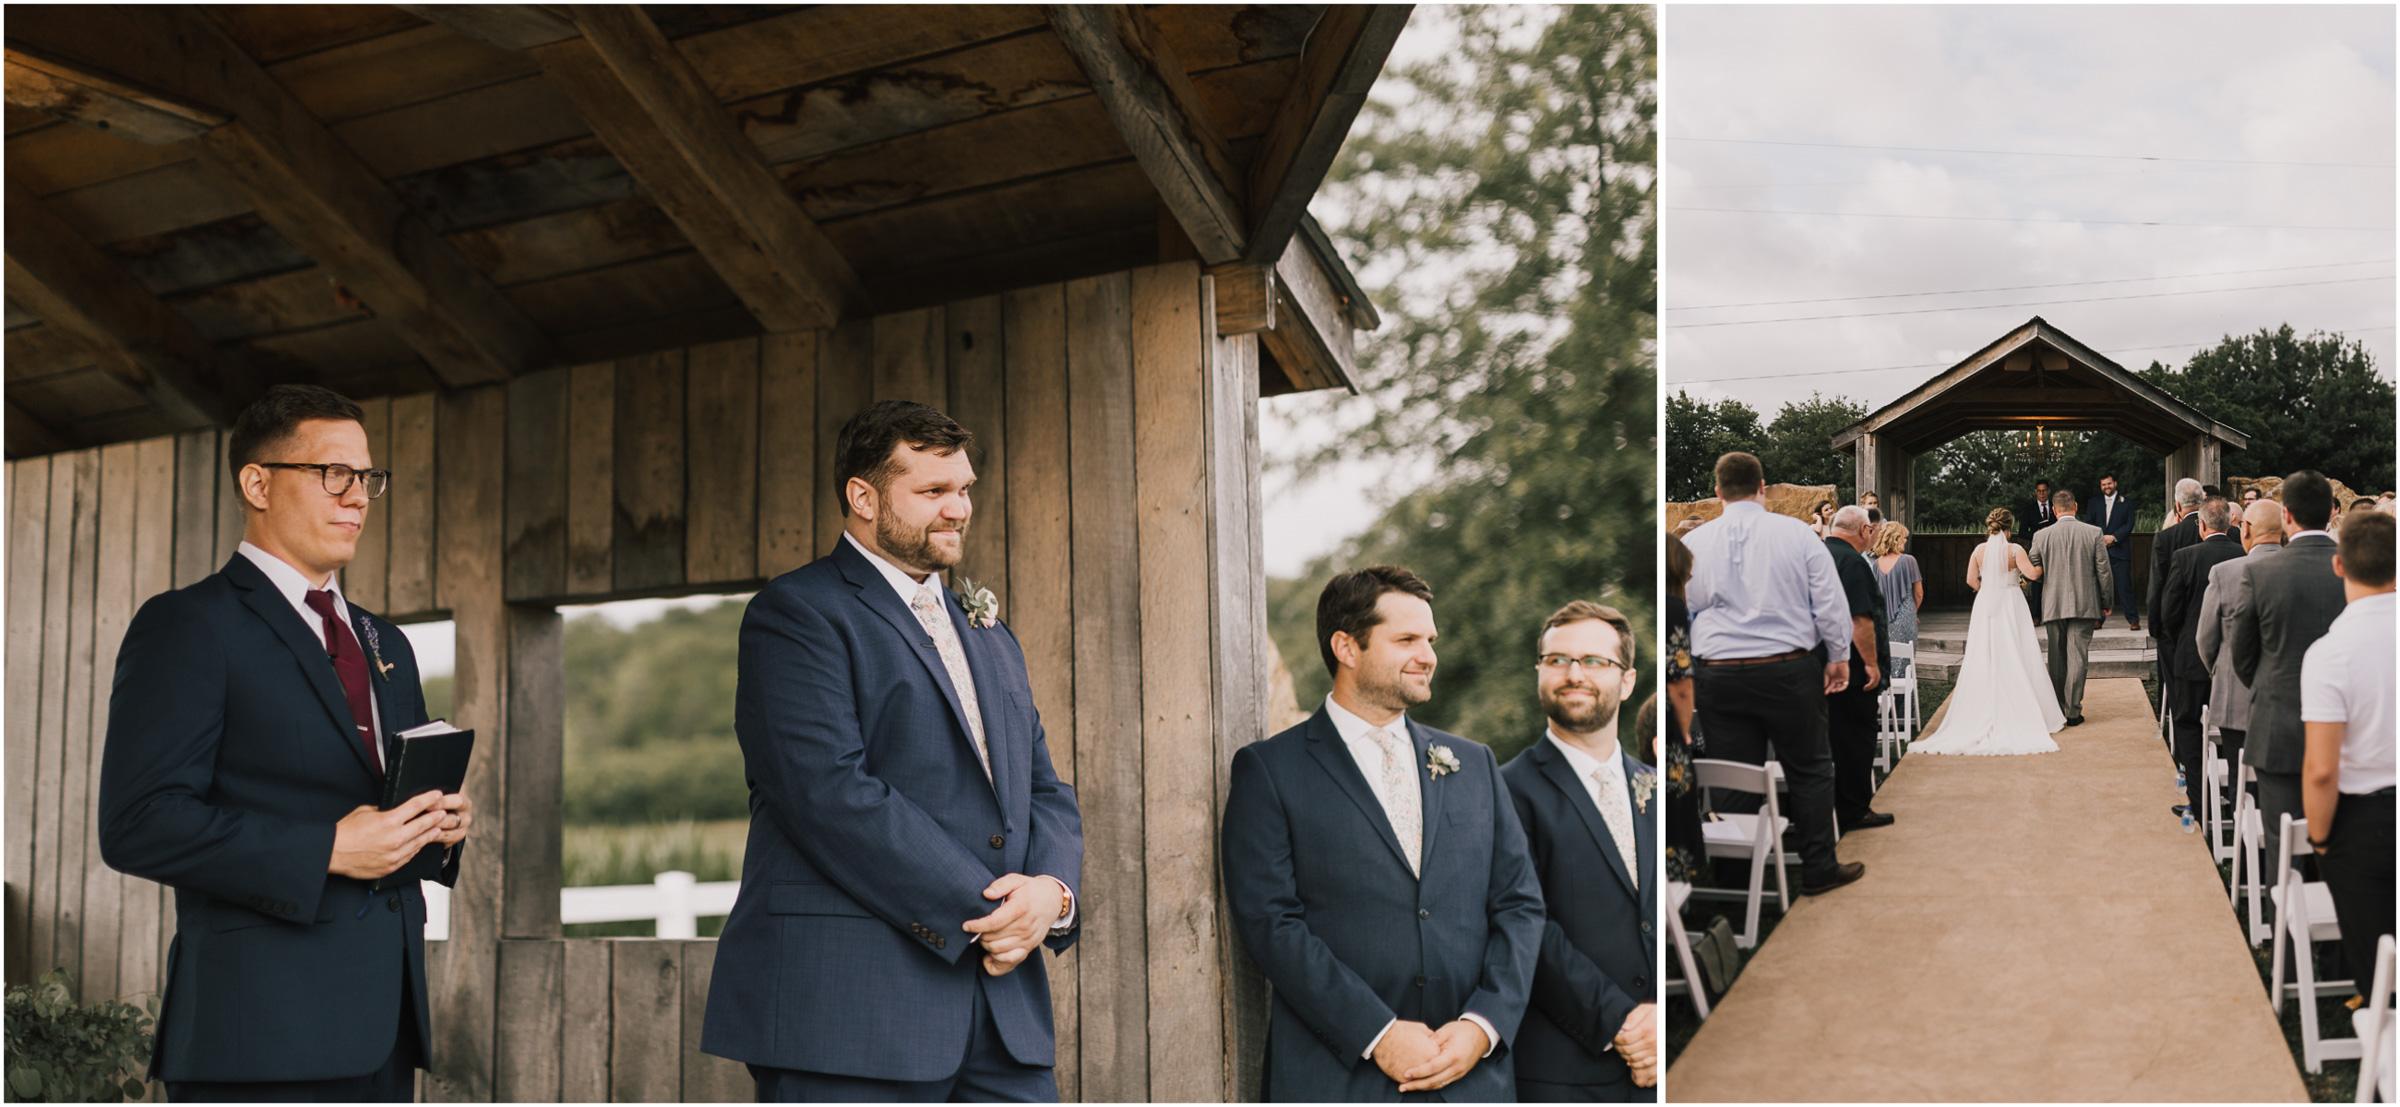 alyssa barletter photography summer odessa missouri wedding kansas city photographer-51.jpg